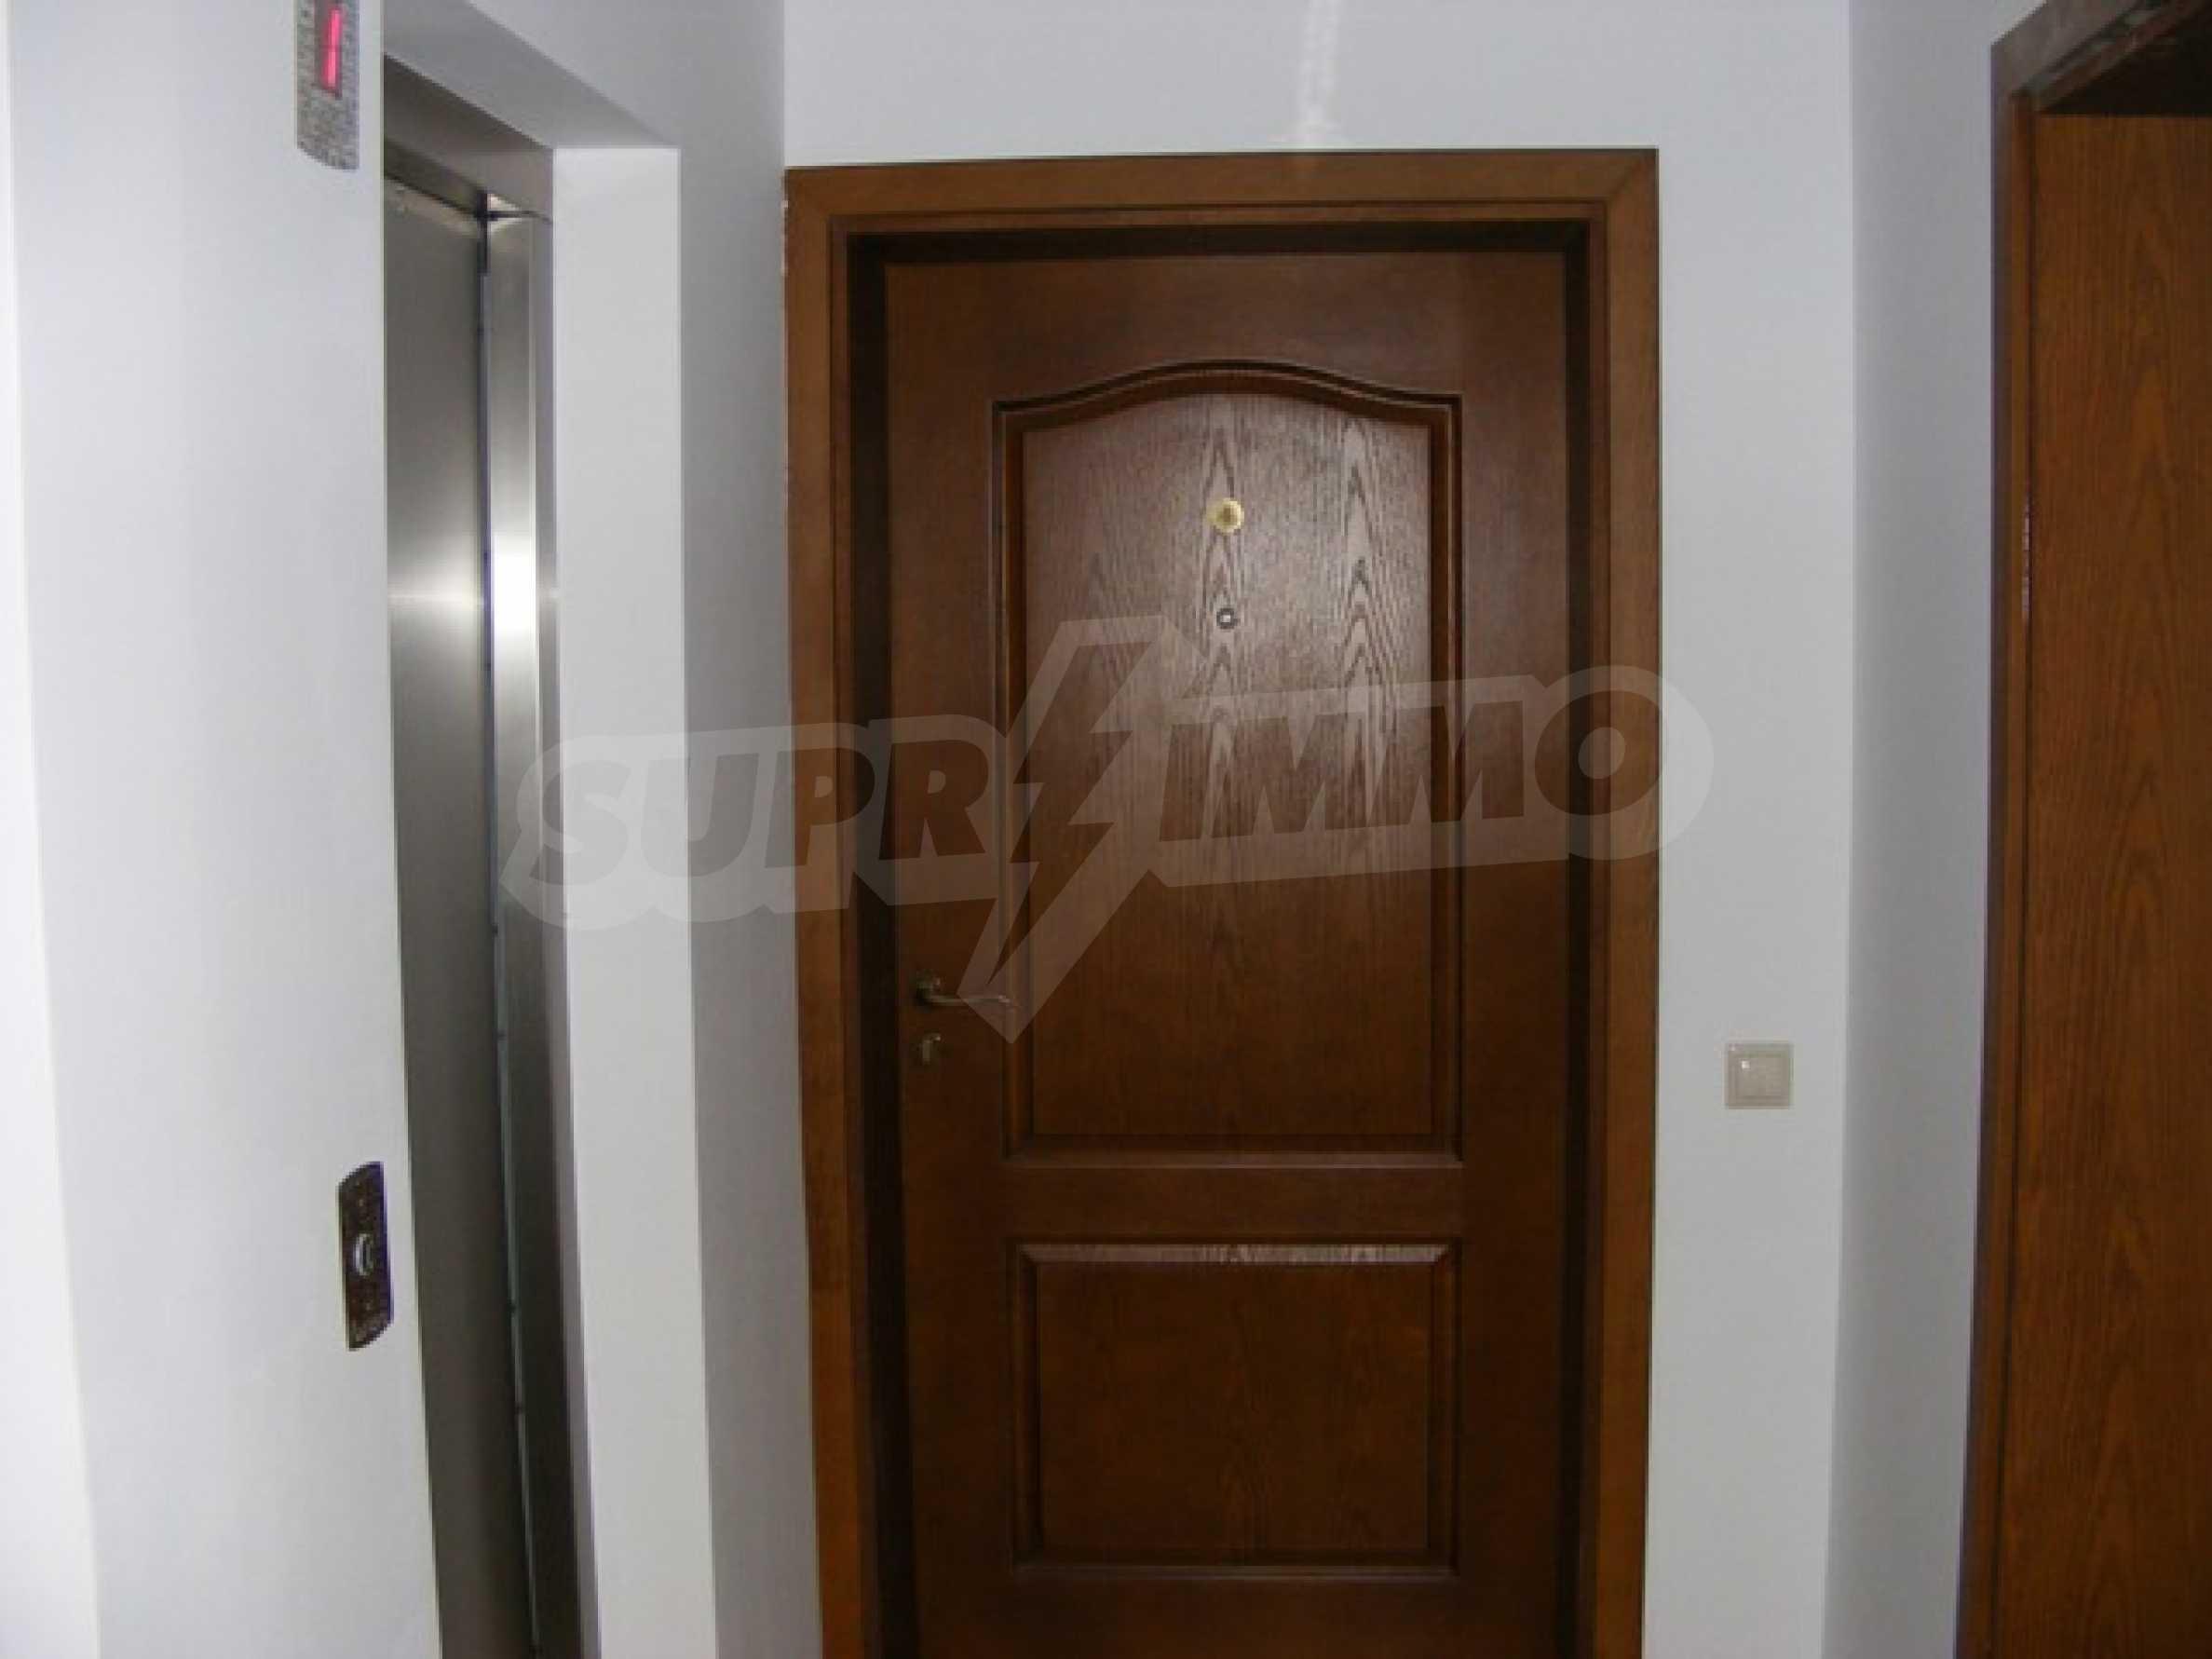 Апартамент Заменхоф 8